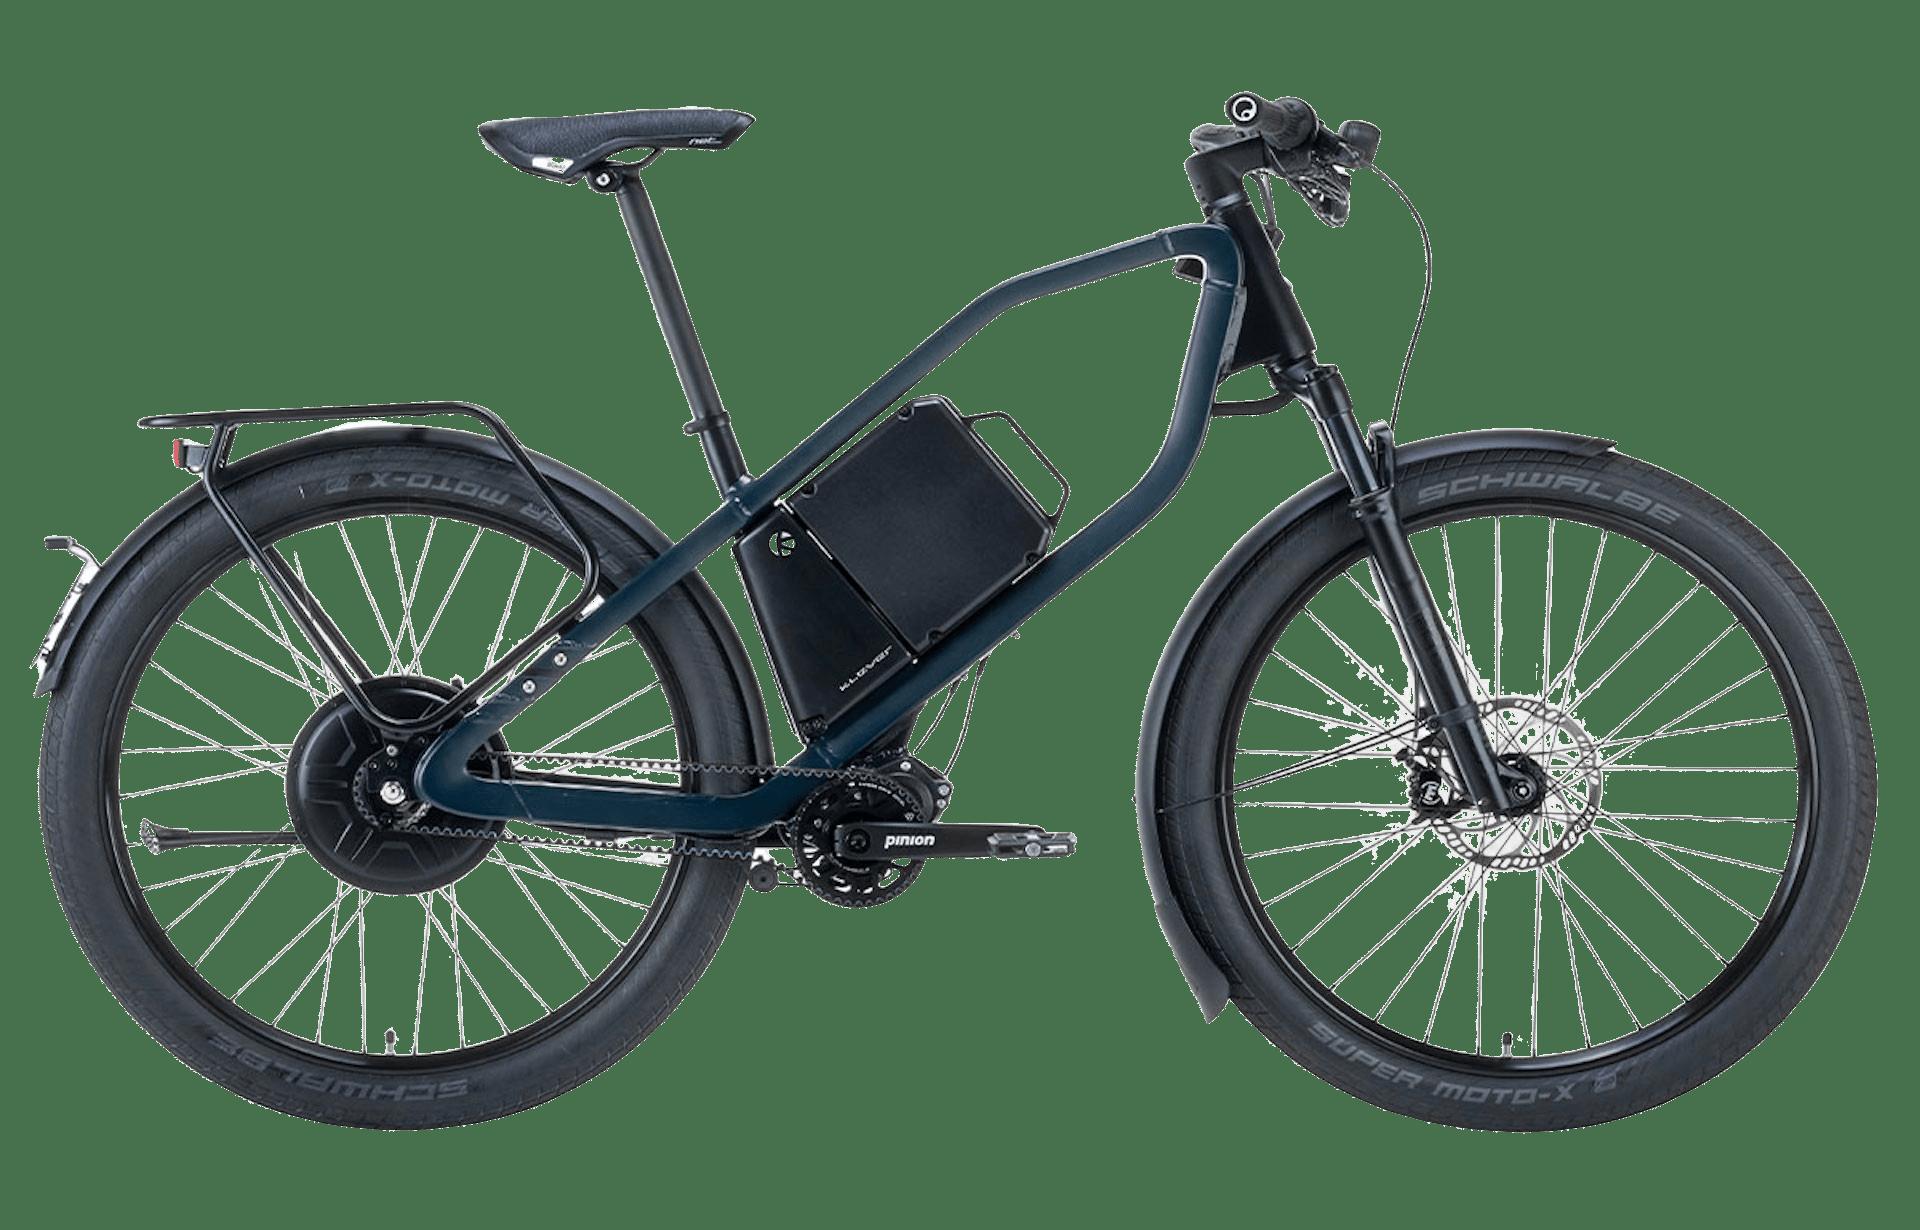 klever x-speed pinion e-bike